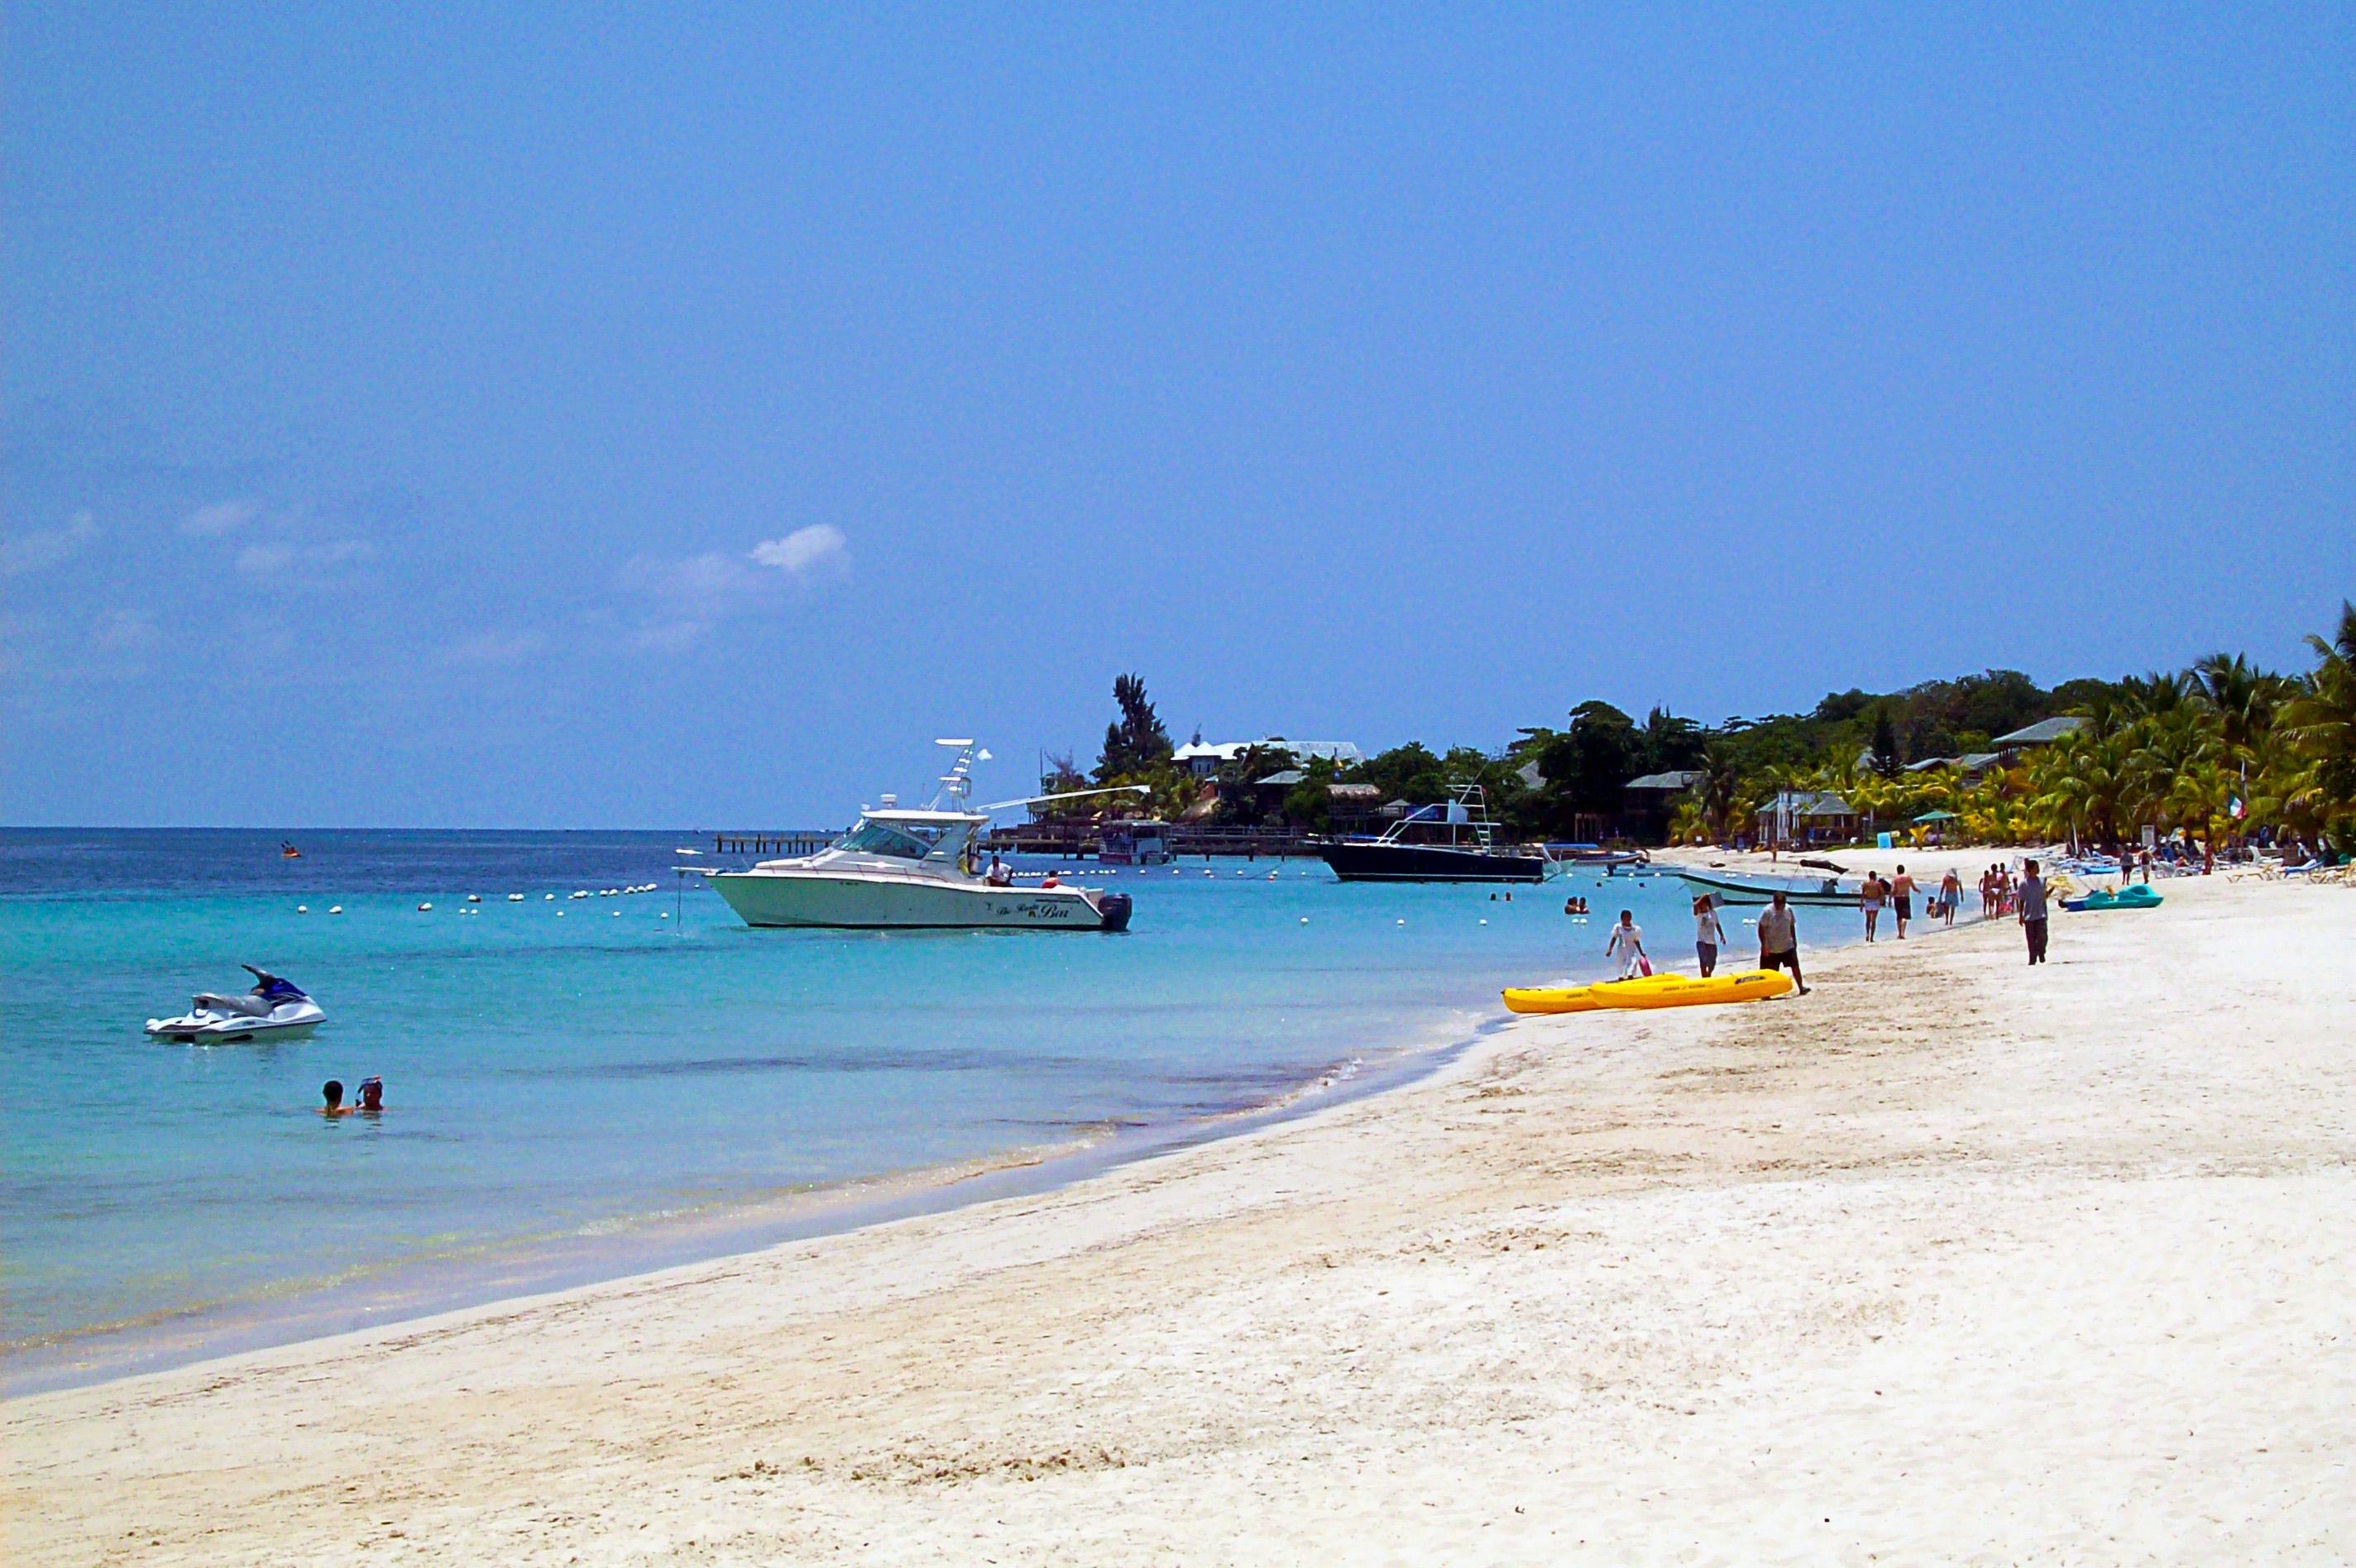 West_Bay_Beach_-Roatan_-Honduras-23May2009-g